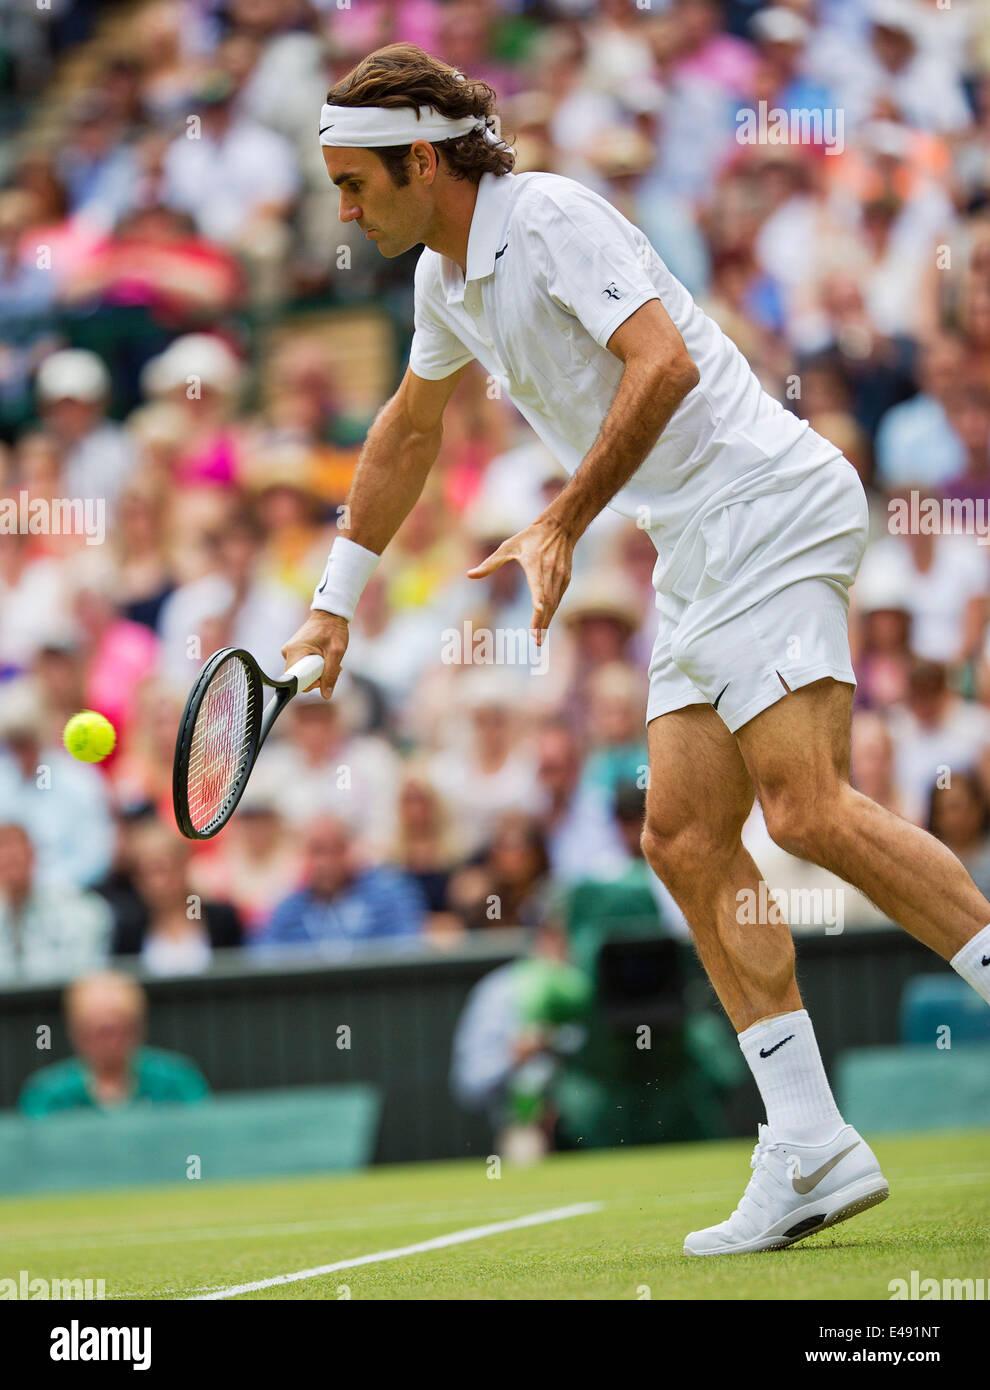 London, UK. 6th July 2014.  Tennis, Wimbledon, AELTC, Men's Singles Final:  Novak Djokovic (SRB) vs Roger Federer - Stock Image